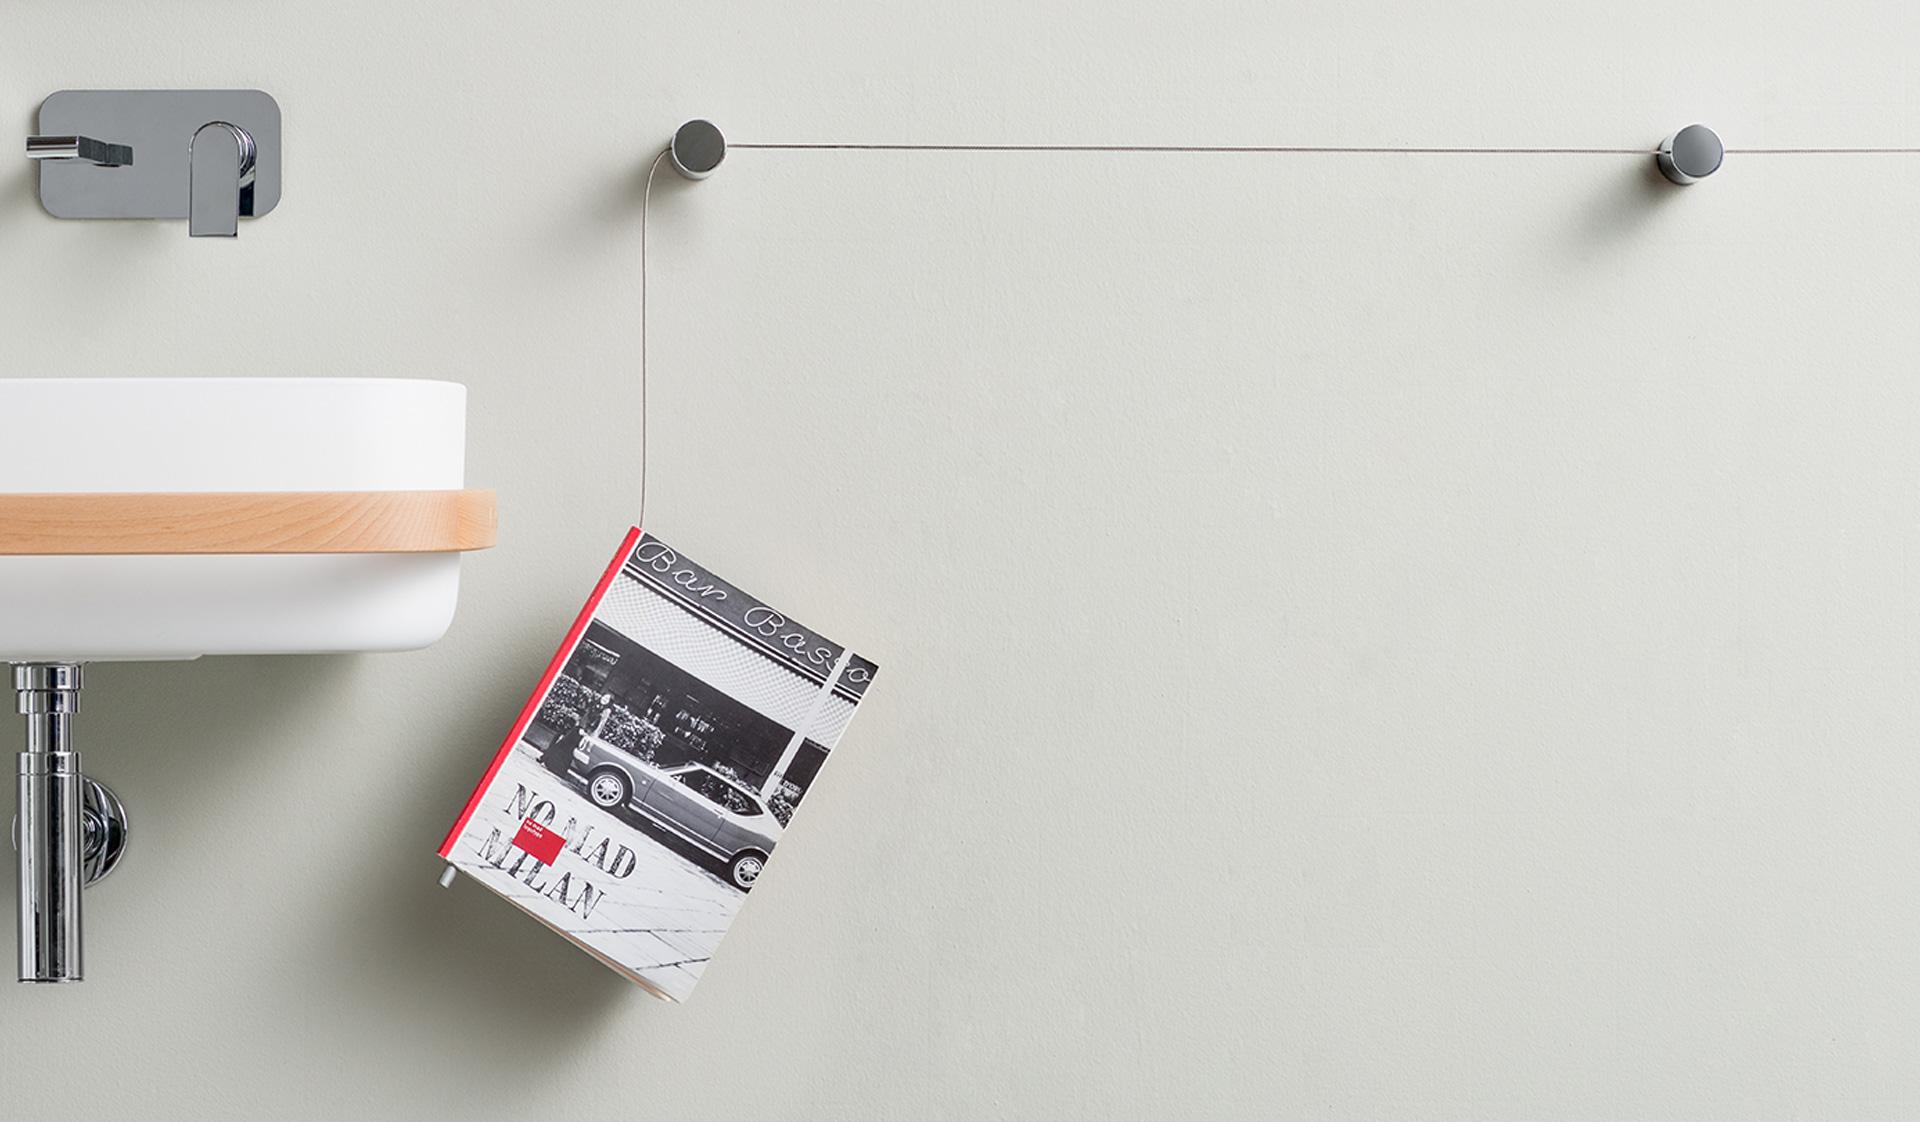 Accessorio bagno design Dot collection ever life design